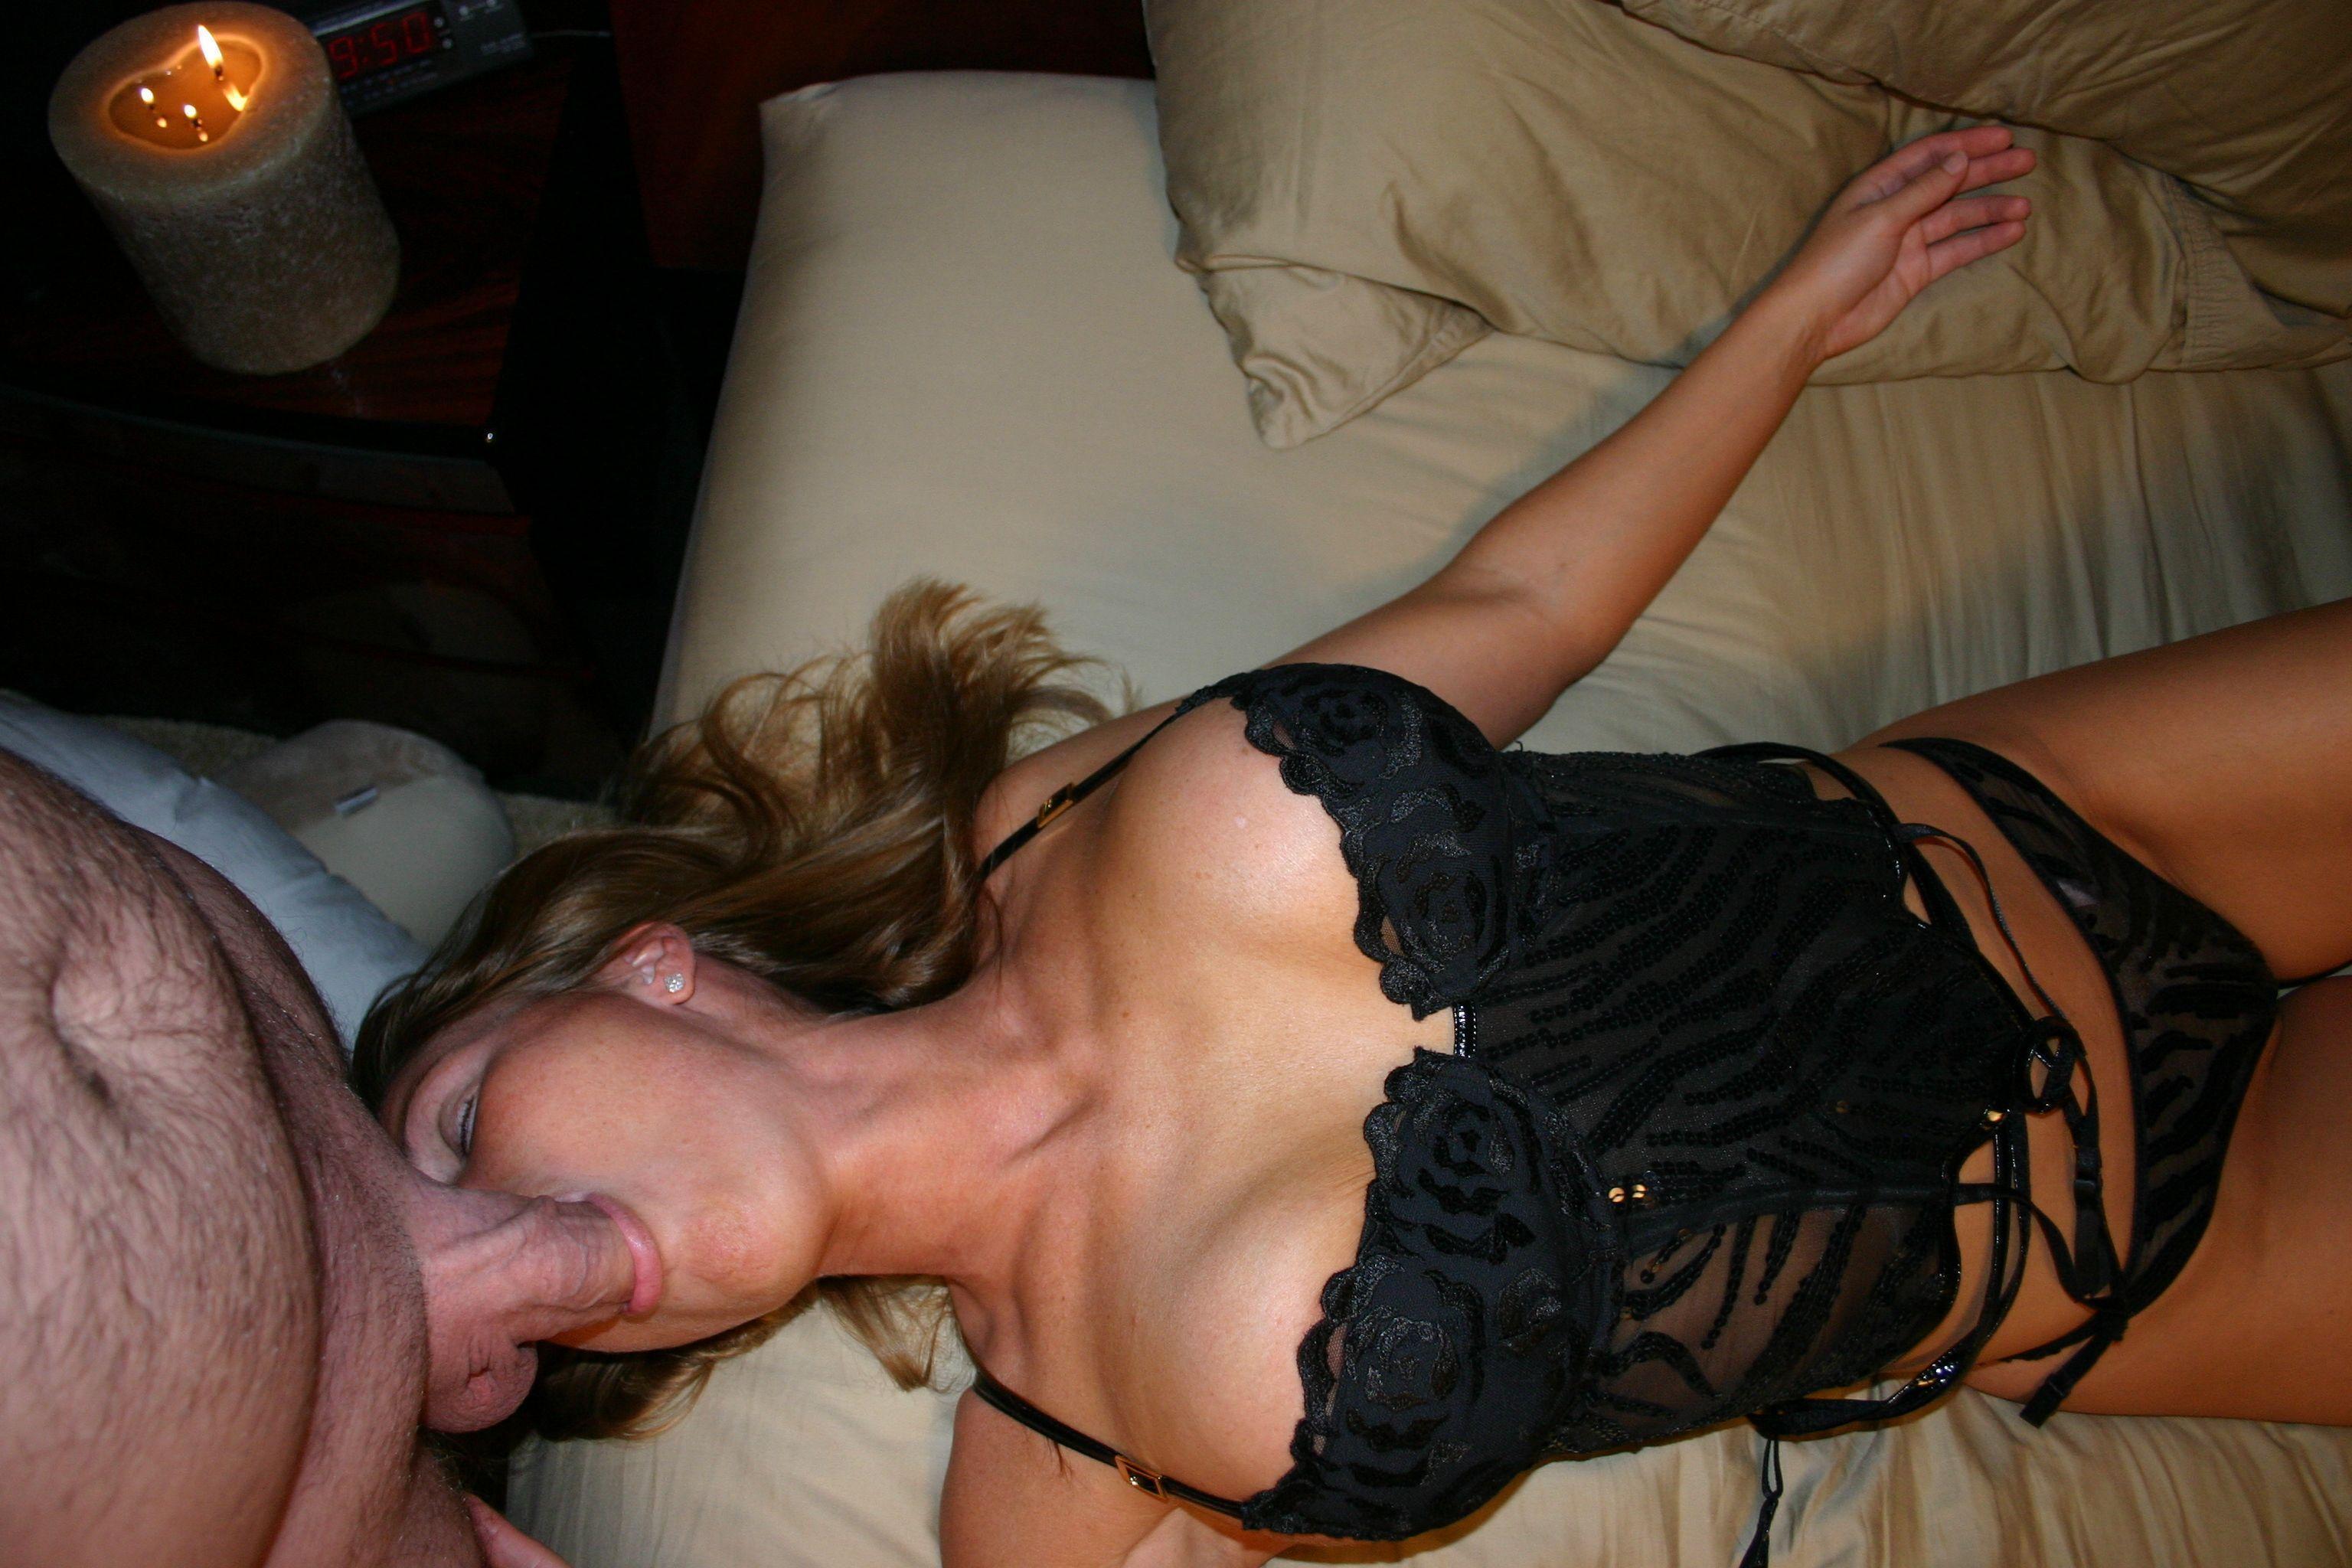 wife-hardcore-blowjob